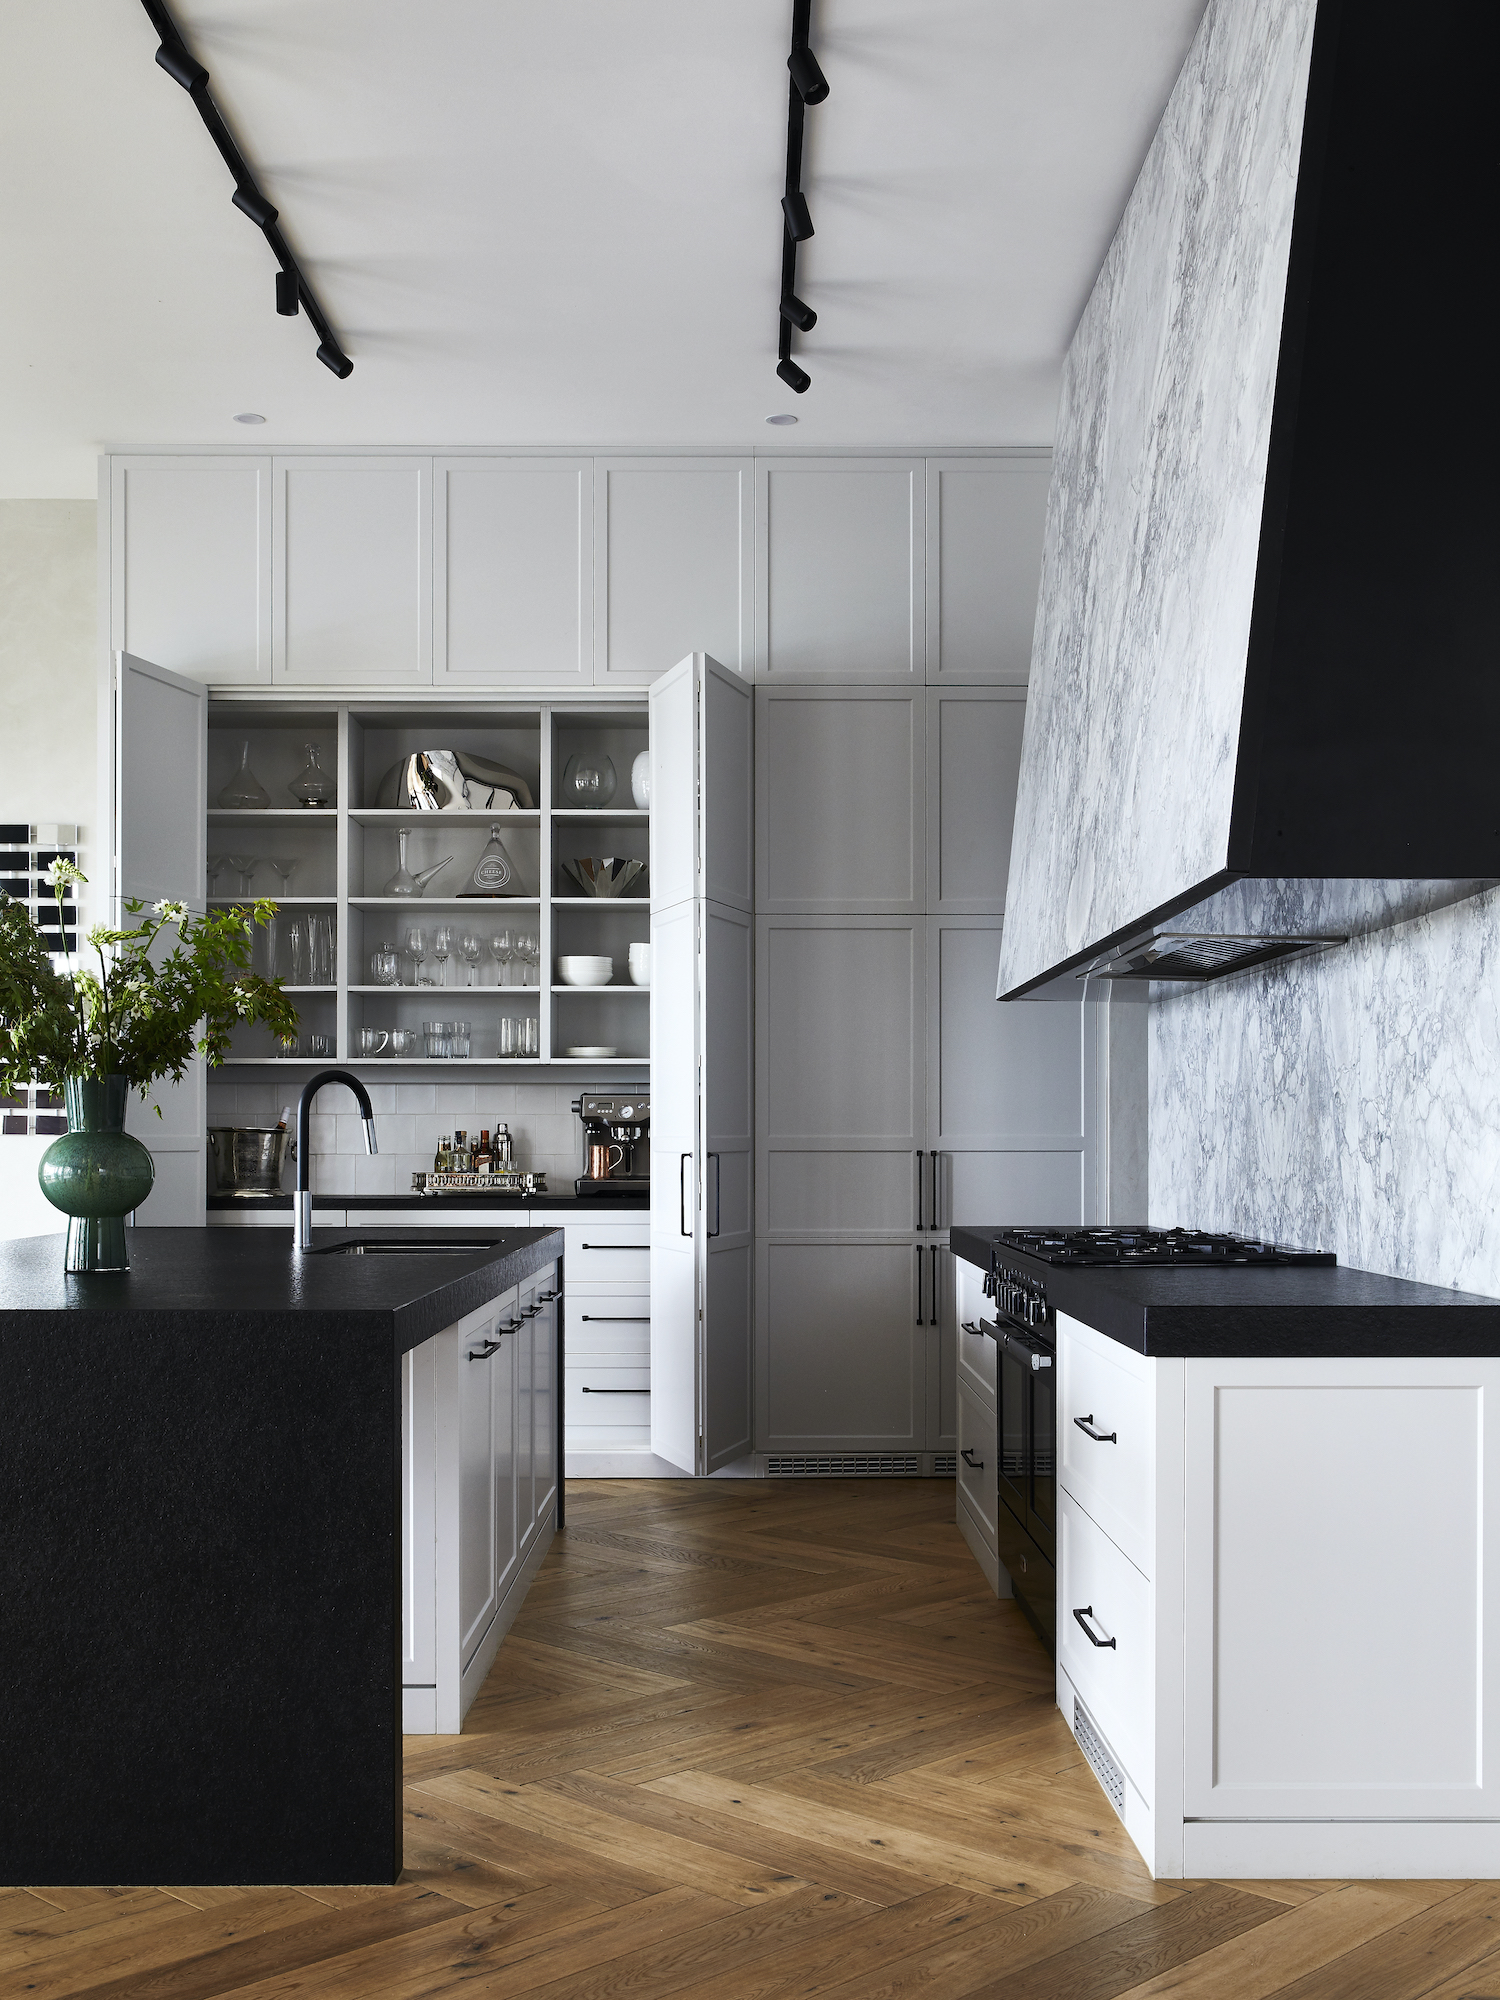 est living kitchen closeup kew house kate walker design 3